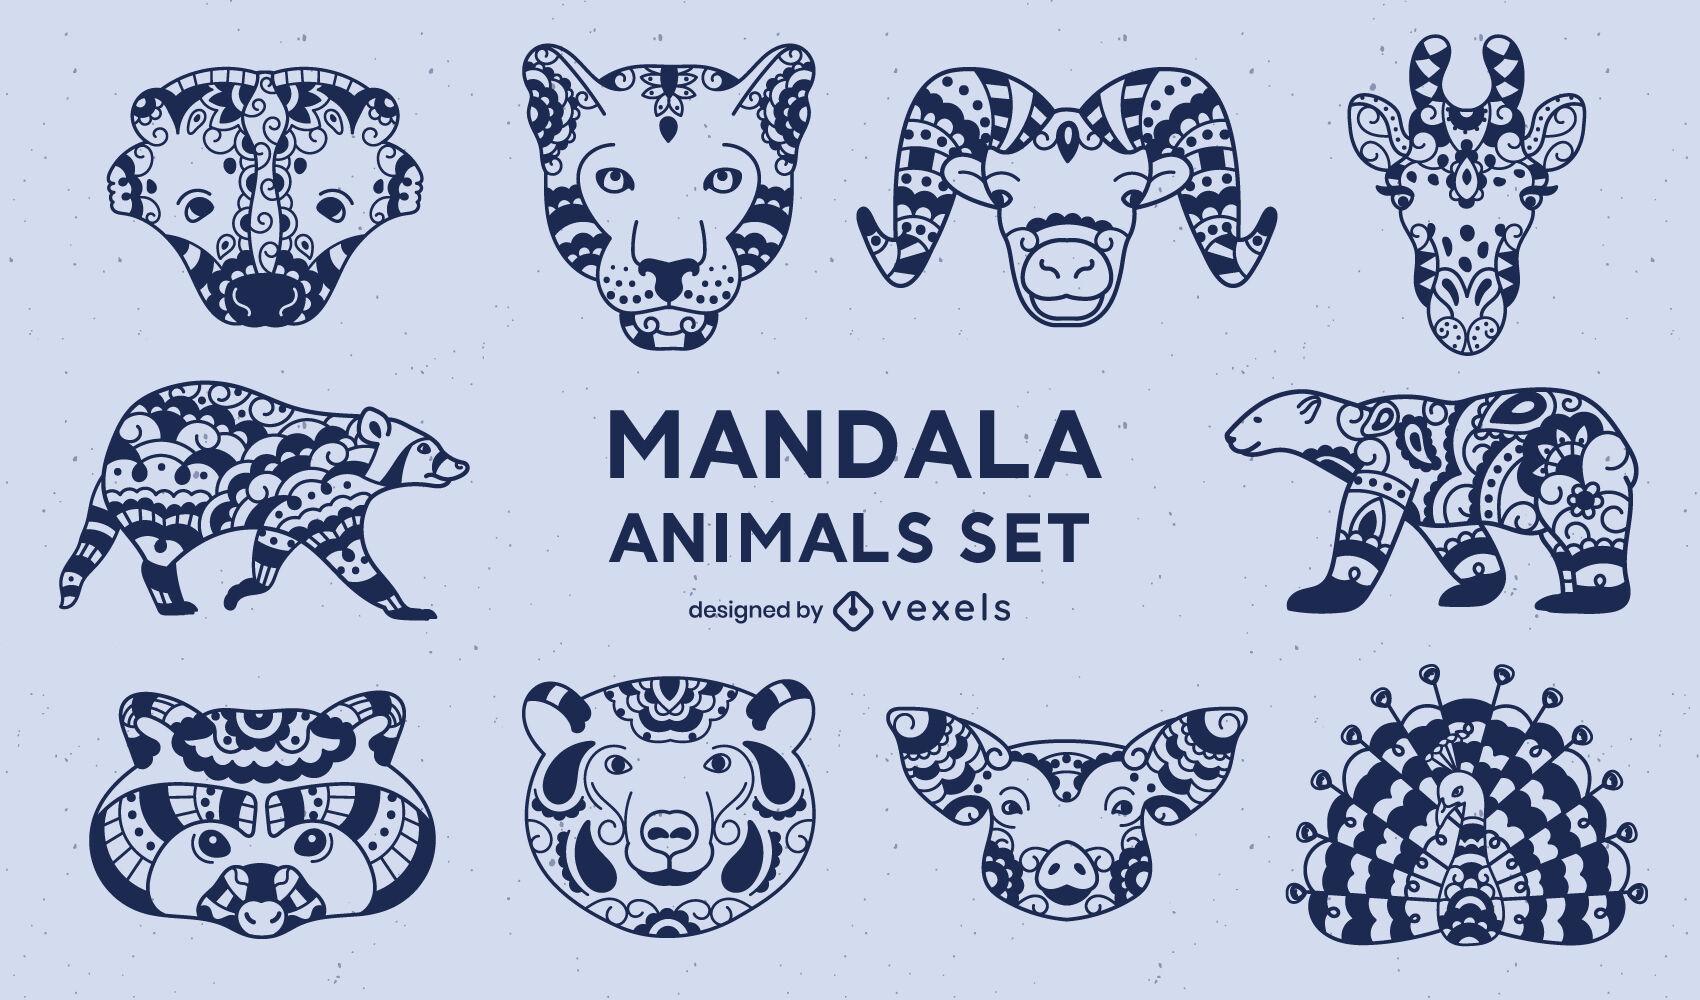 Conjunto de animales en estilo mandala.